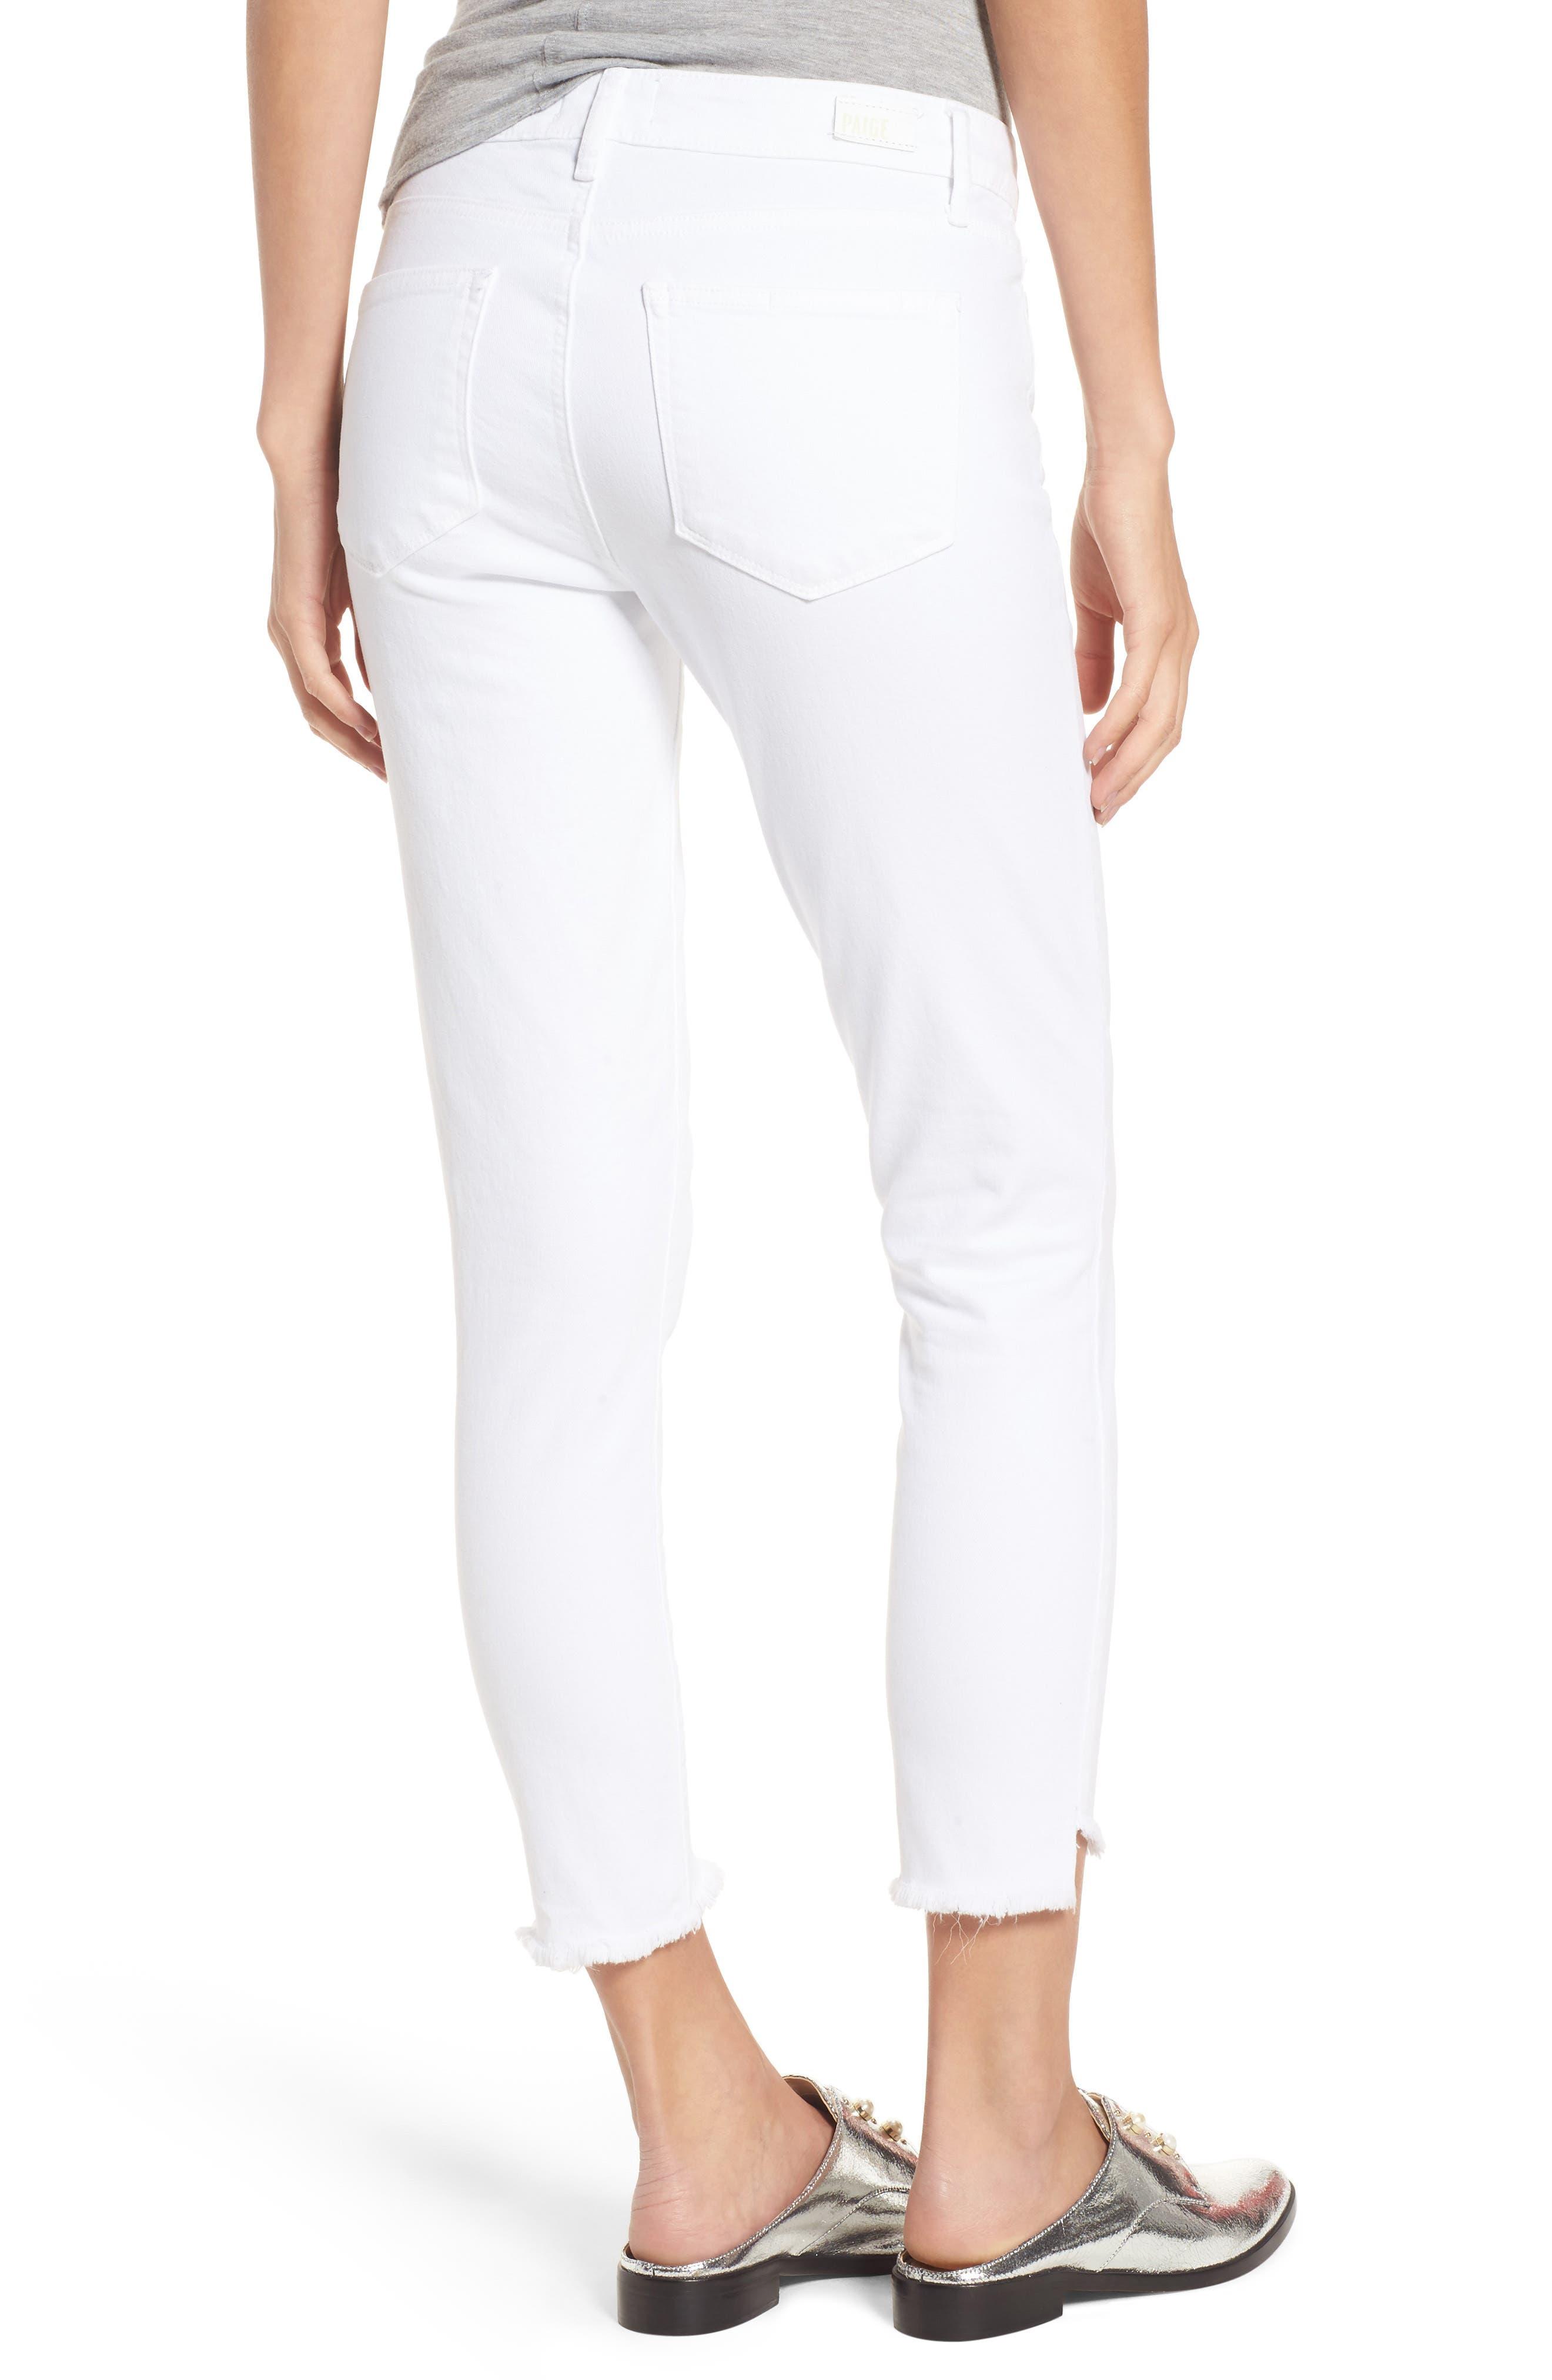 Verdugo Slanted Crop Skinny Jeans,                             Alternate thumbnail 2, color,                             CRISP WHITE